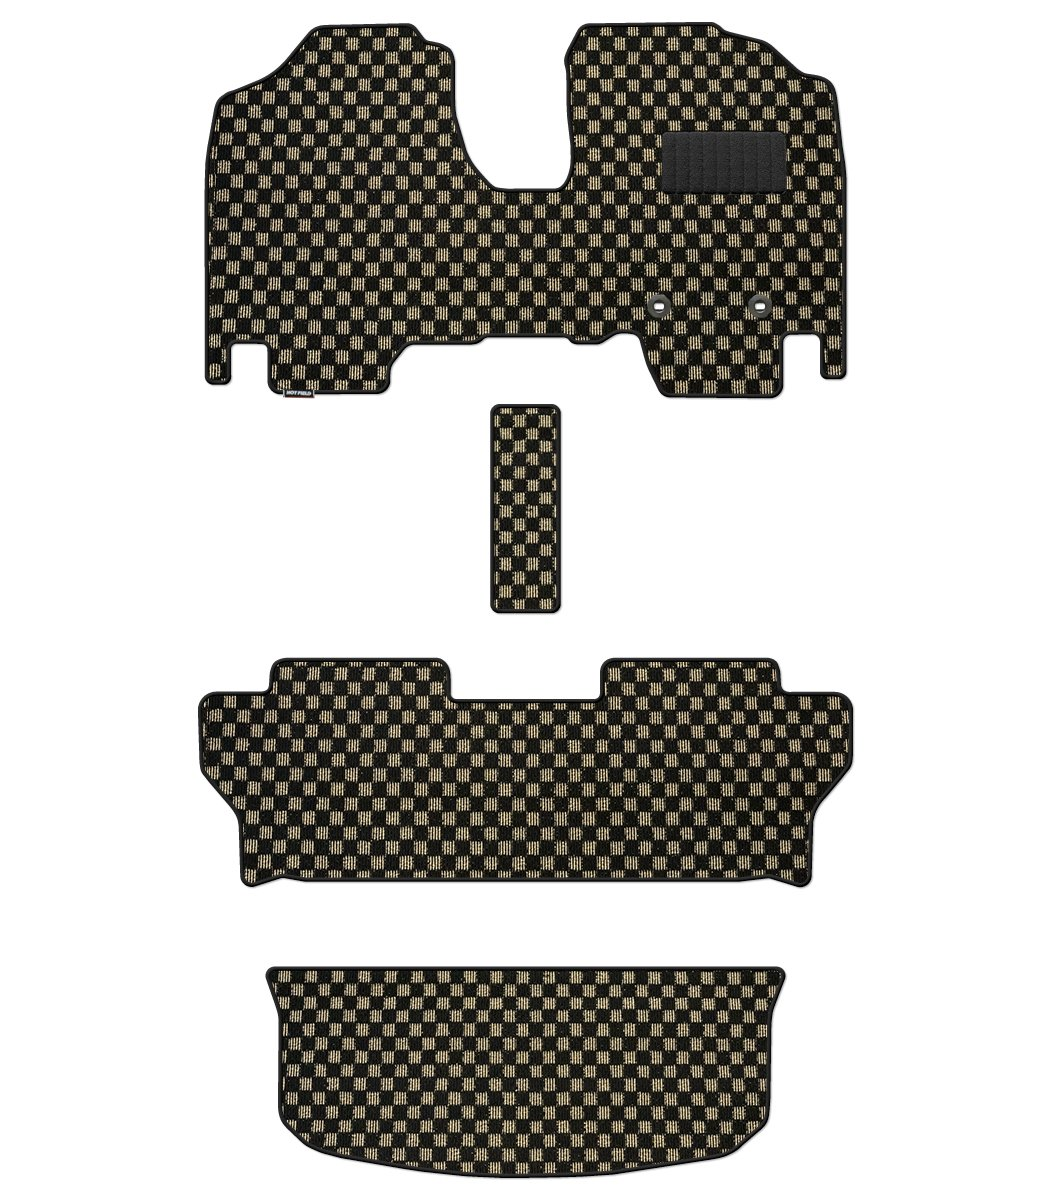 Hotfield ルーミー タンク 900系 フロアマット+トランクマット ◆カジュアルチェック フロントマット=一体仕様 チェックゴールド B01MSNSSD4 フロントマット=一体仕様|チェックゴールド チェックゴールド フロントマット=一体仕様